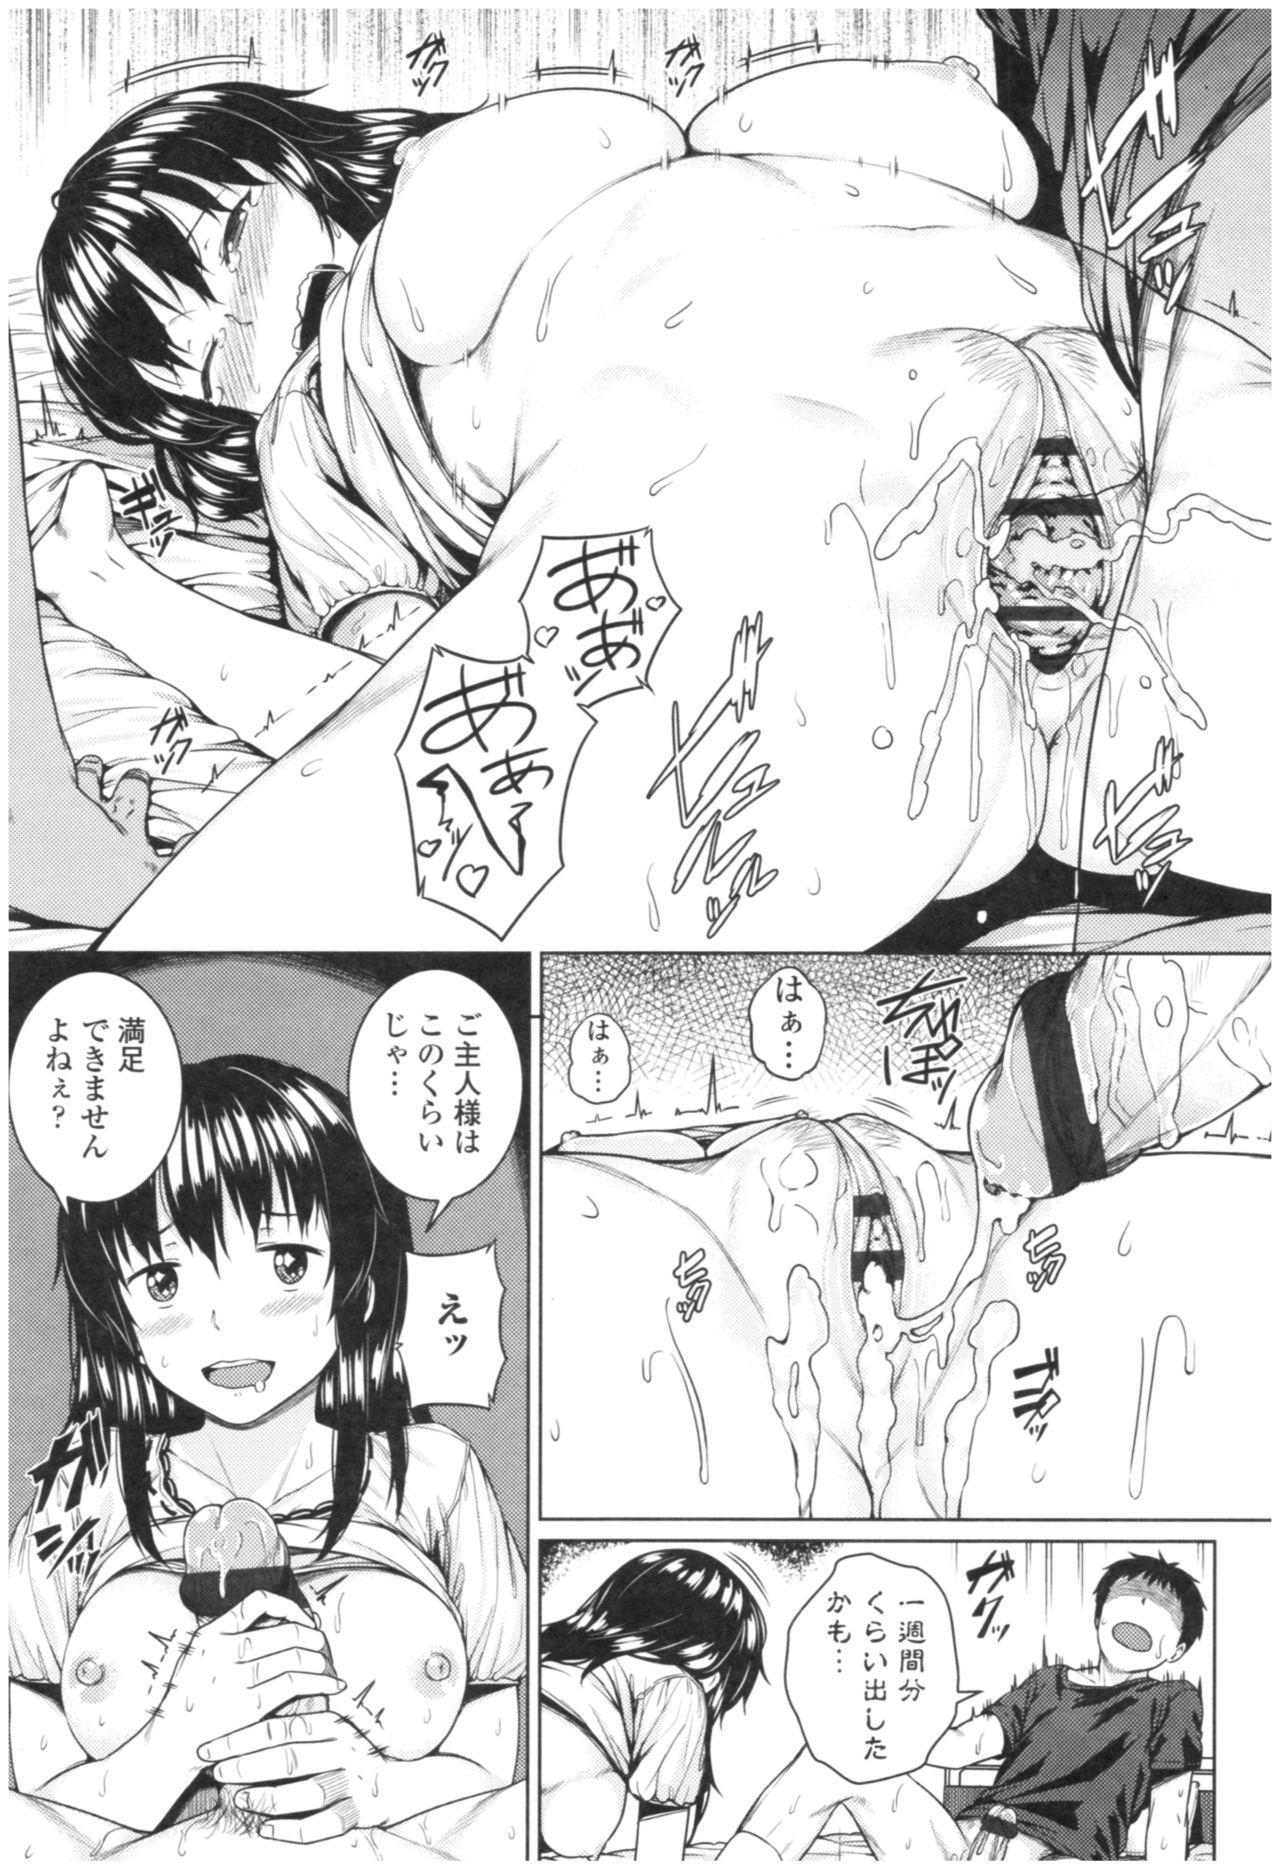 Bitch Kanojo no Hatsukoi Jouji - Her Lewd First Love and SEX 169